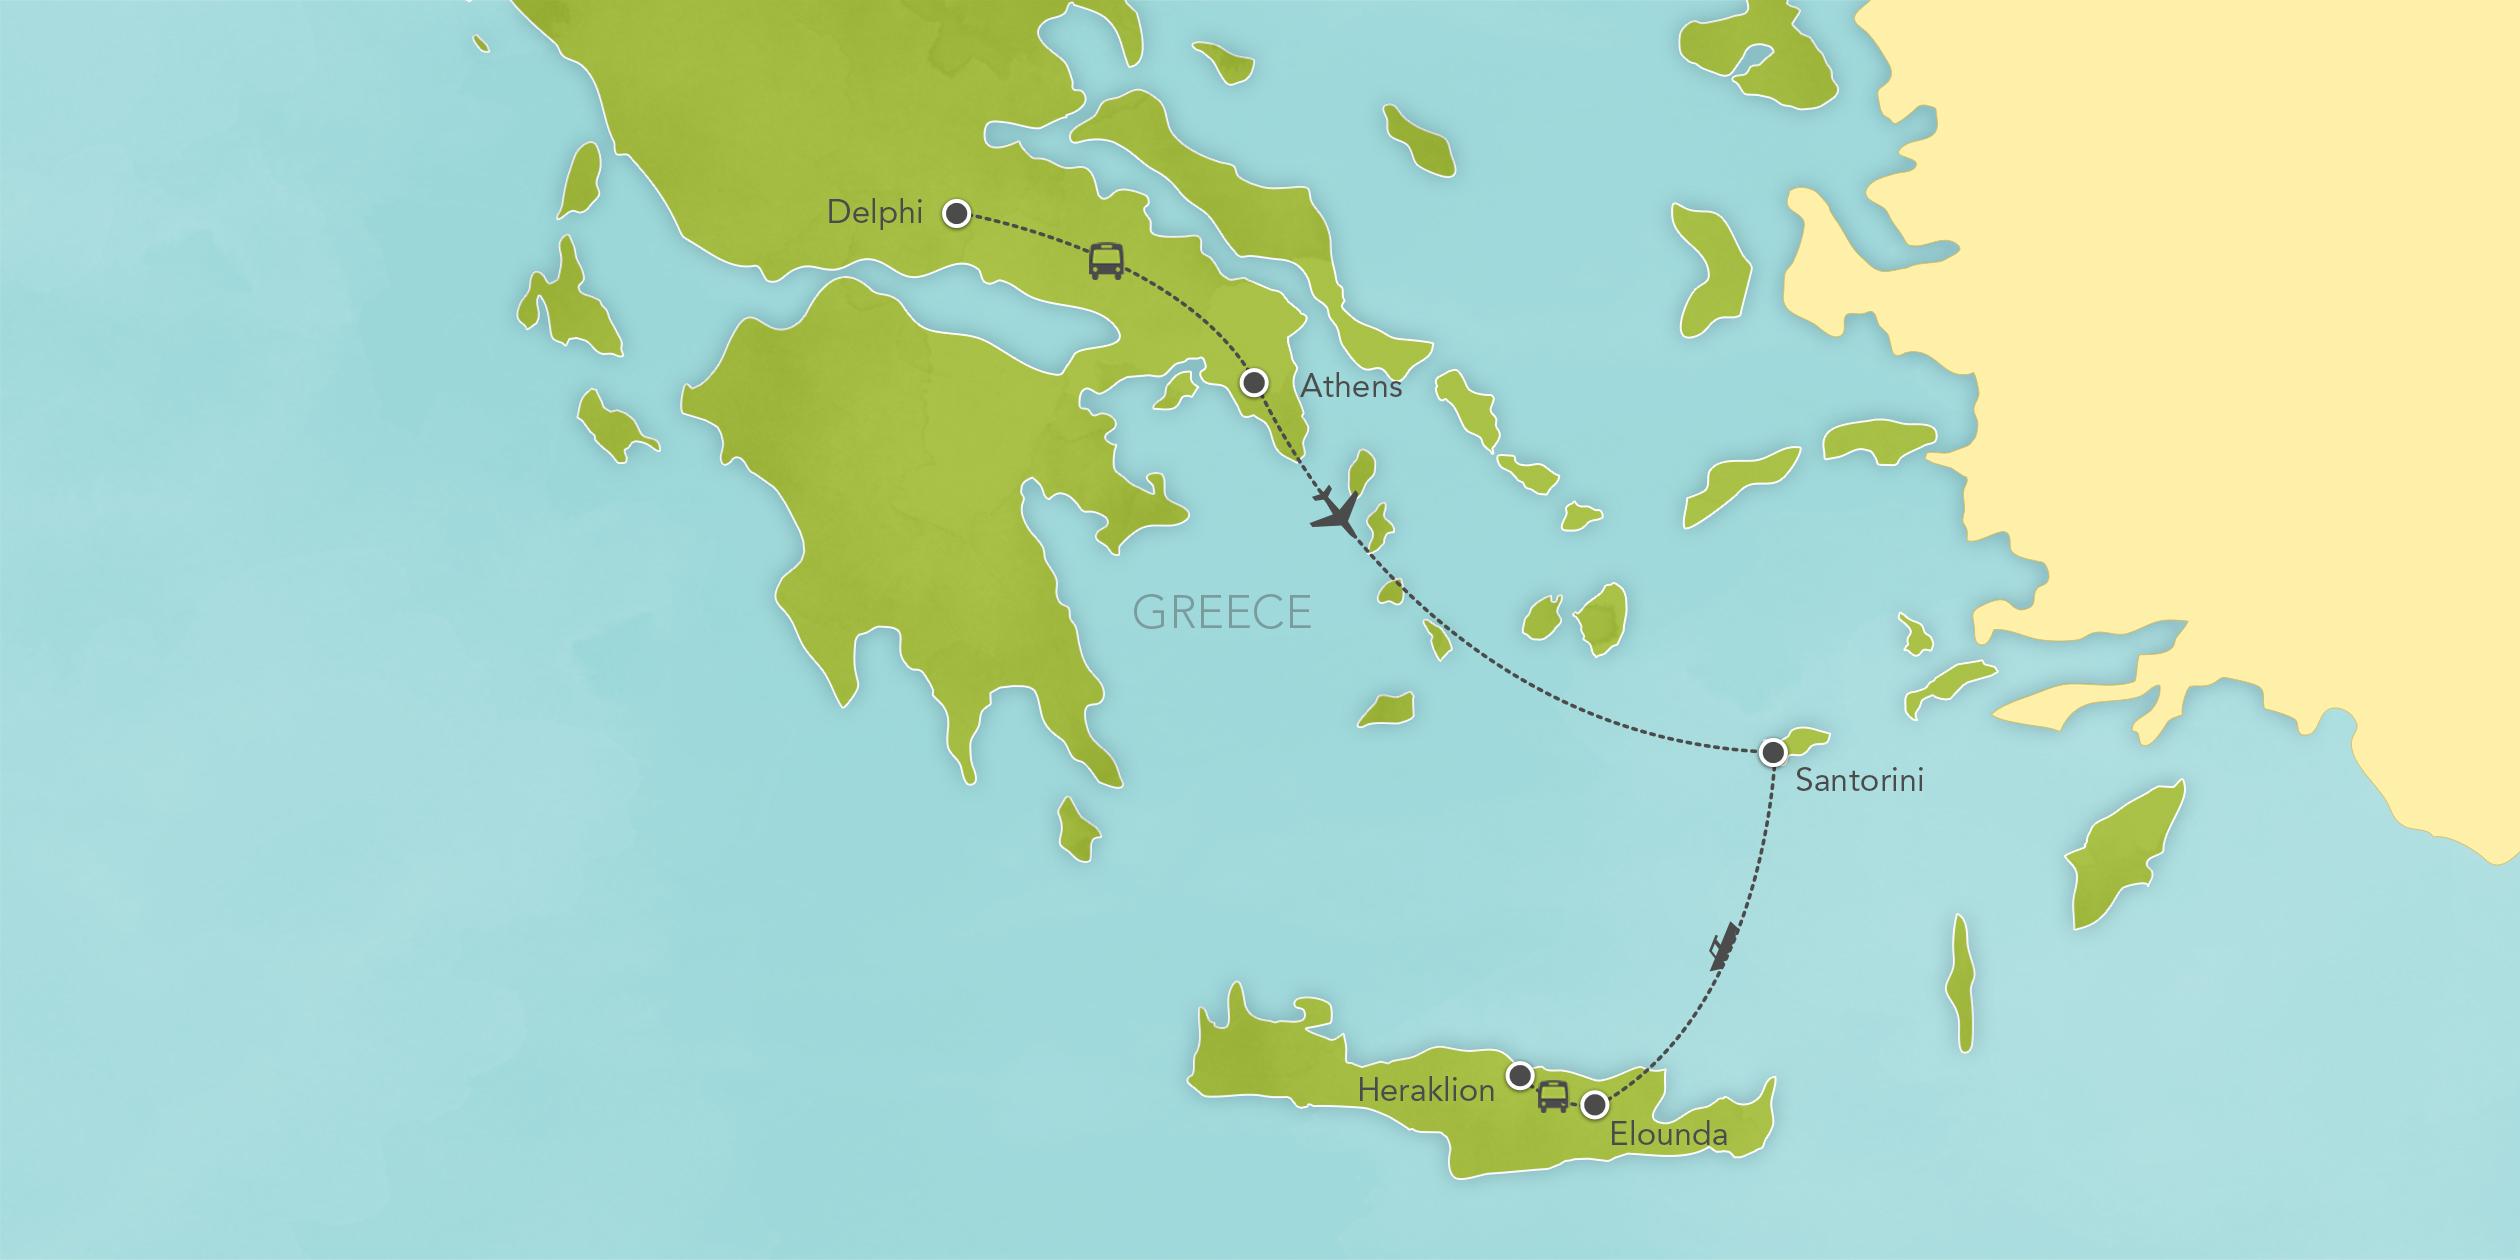 Itinerary map of Greece: Athens, Delphi, Santorini, Crete 2019